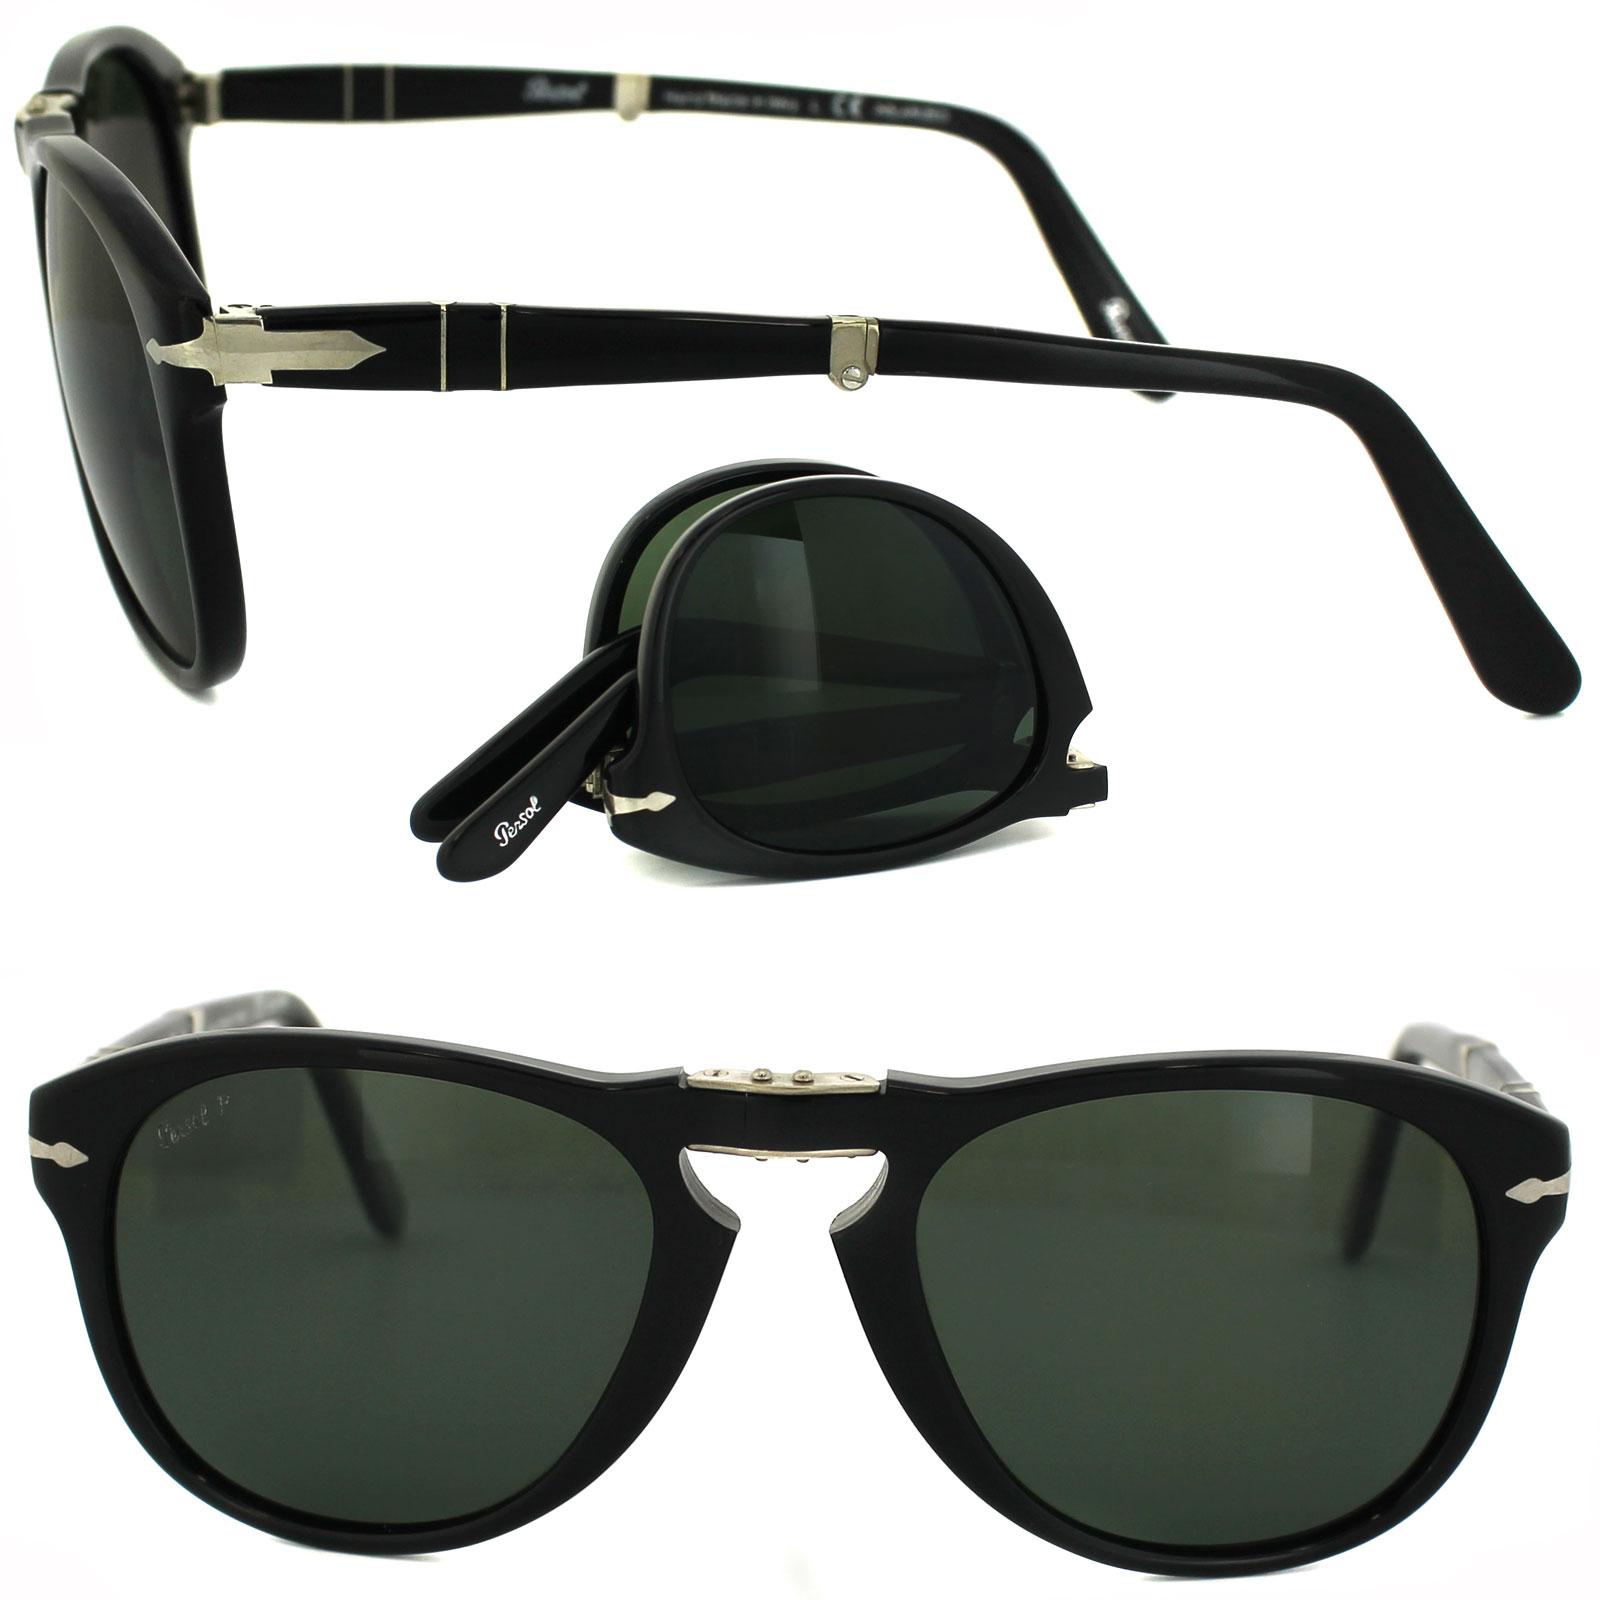 5c479c25bf Sentinel Persol Sunglasses 714 95 58 Black Green Polarized Folding Steve  McQueen 54mm